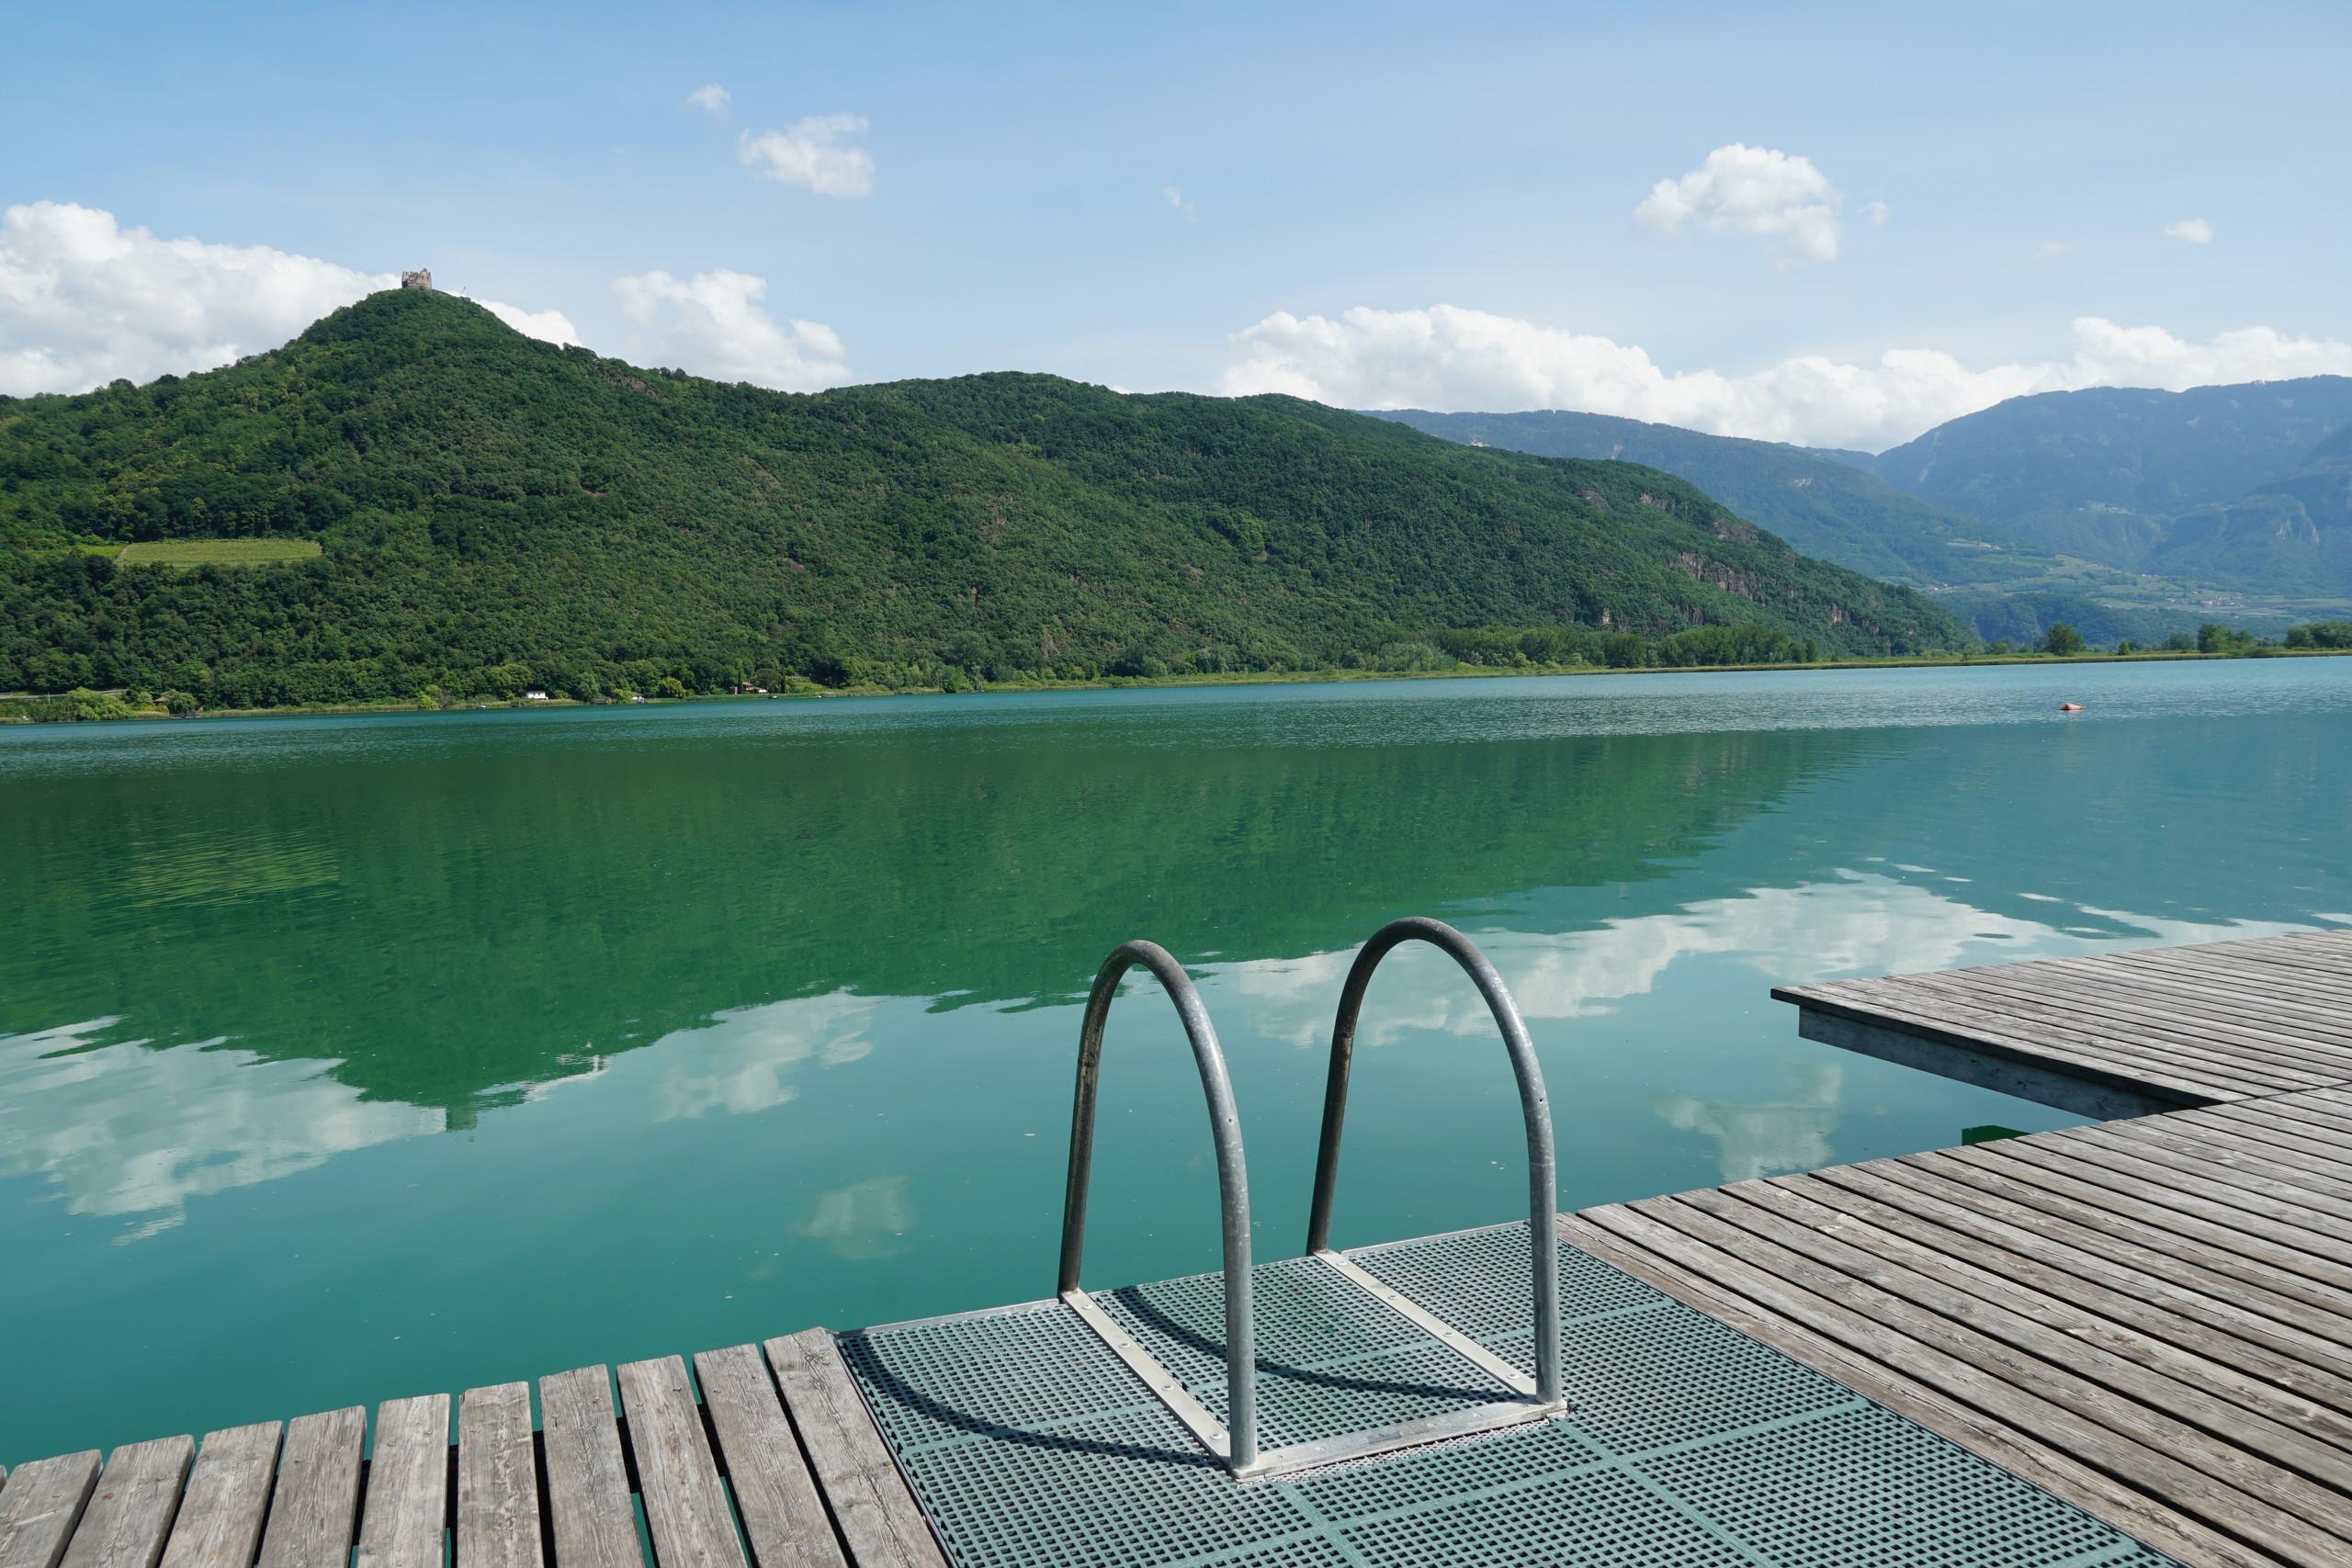 Calm waters of Kaldaro lake. Season begins but nobody knows how...